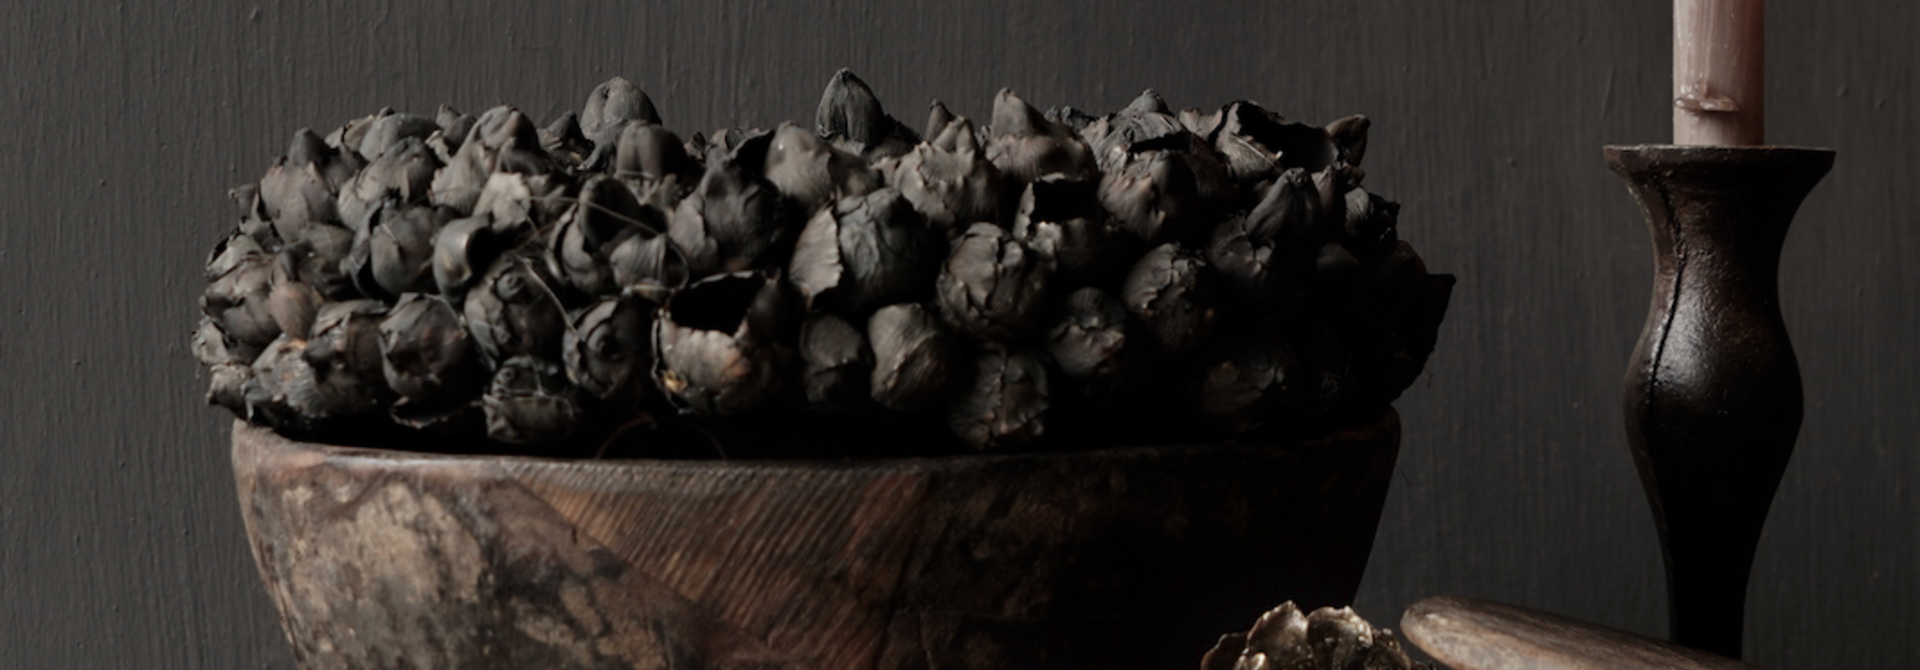 Nepalese oud houten Pot met deksel